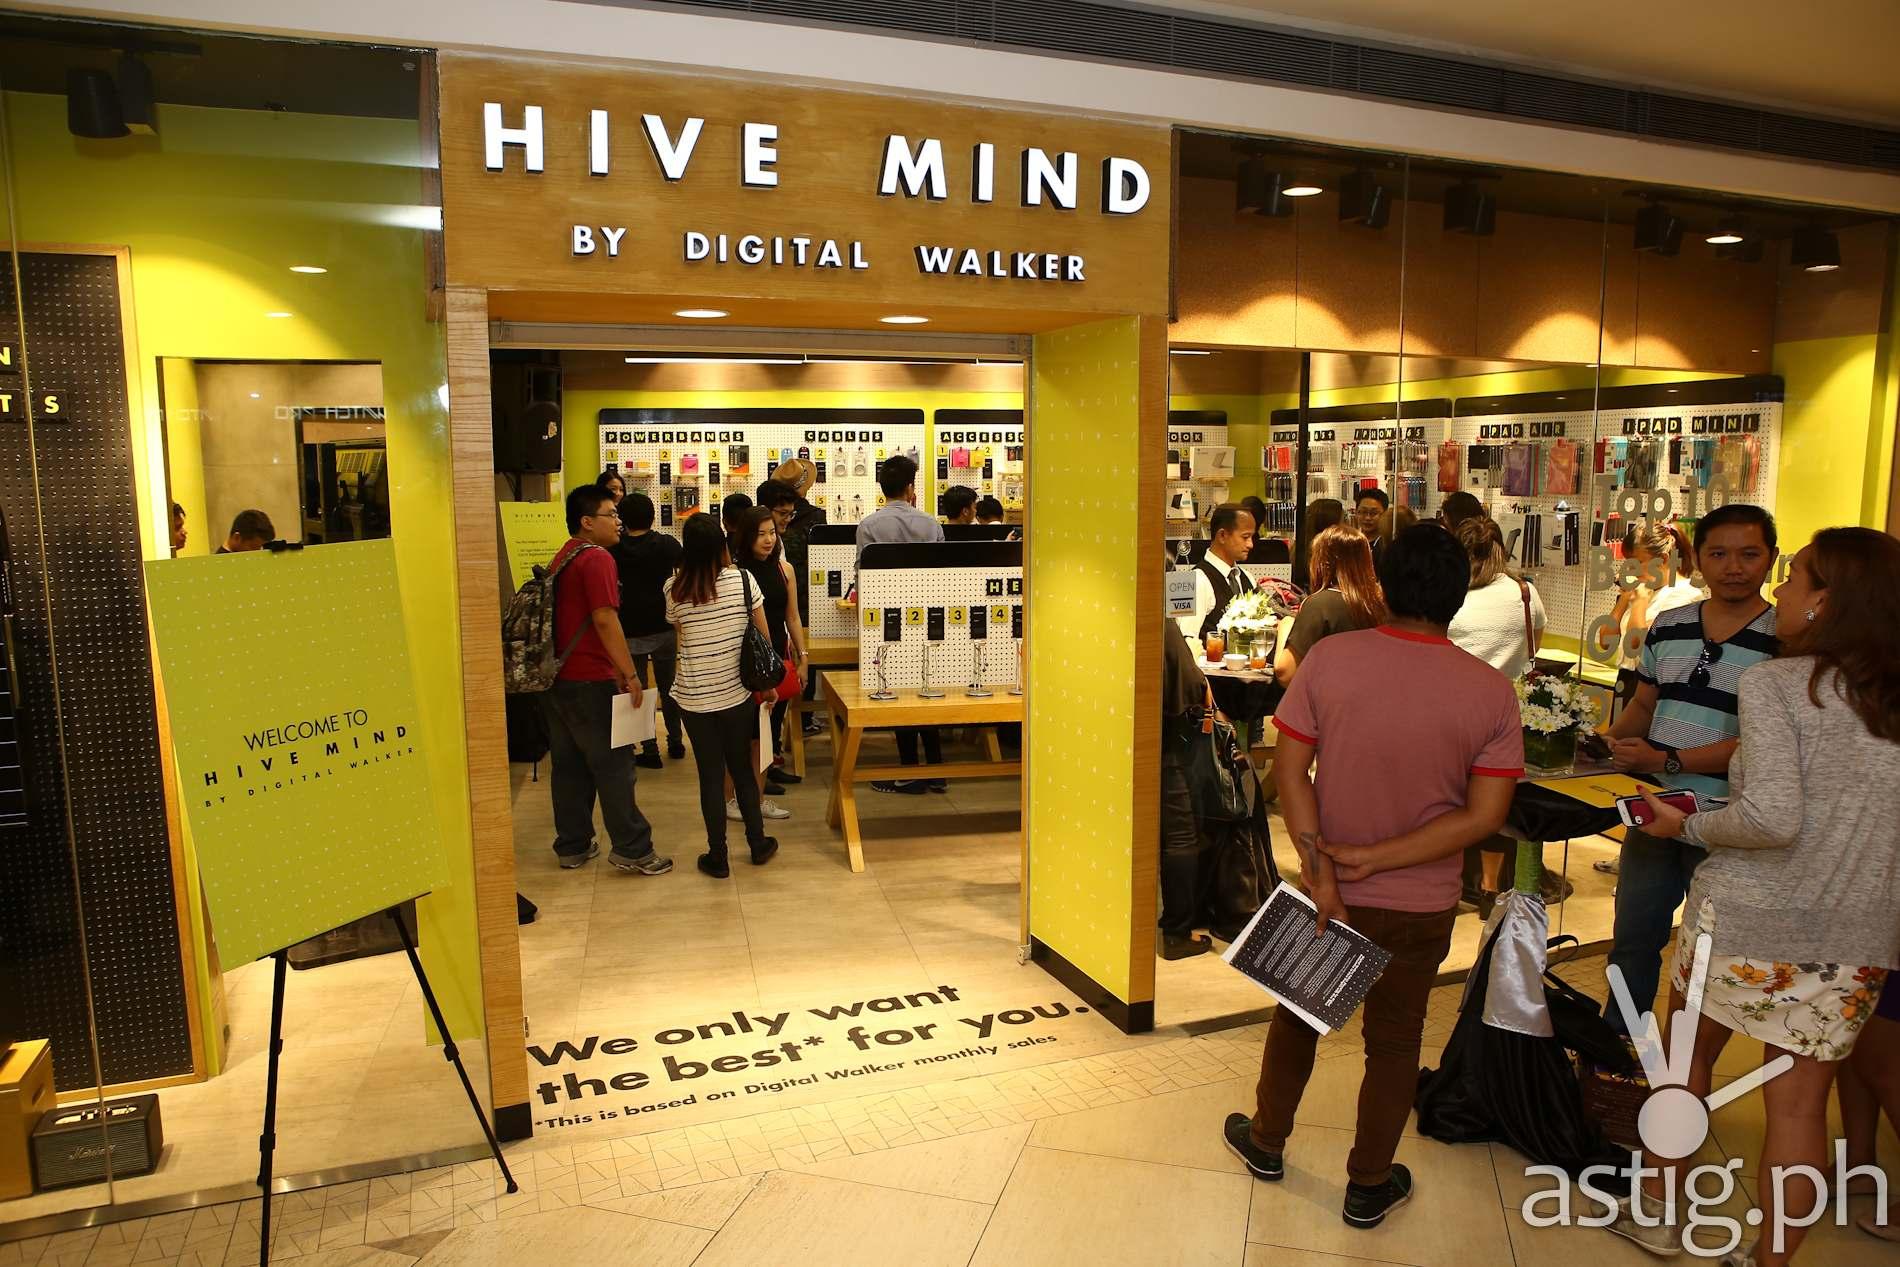 Hive Mind by Digital Walker is now open in TriNoMa